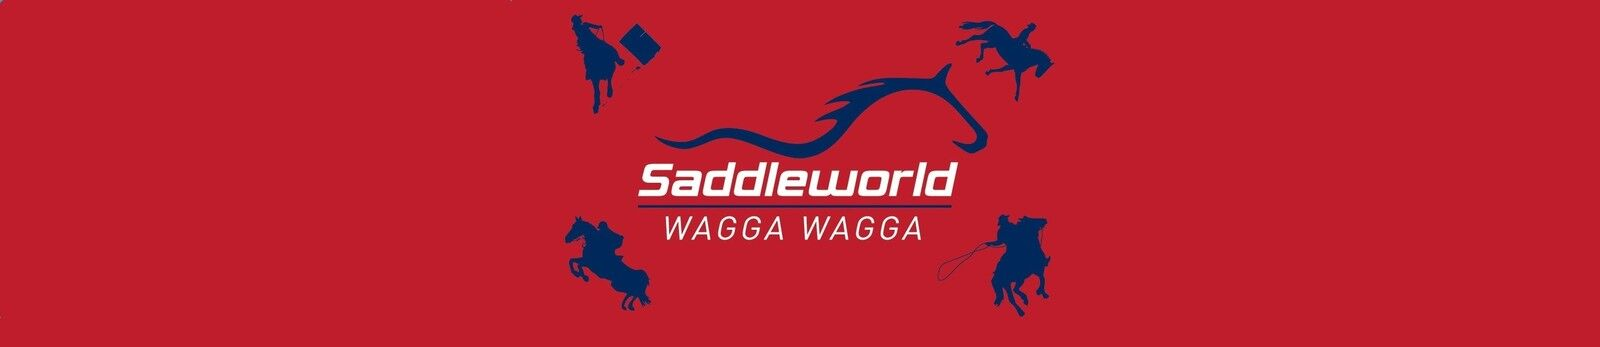 Saddleworld Wagga Wagga